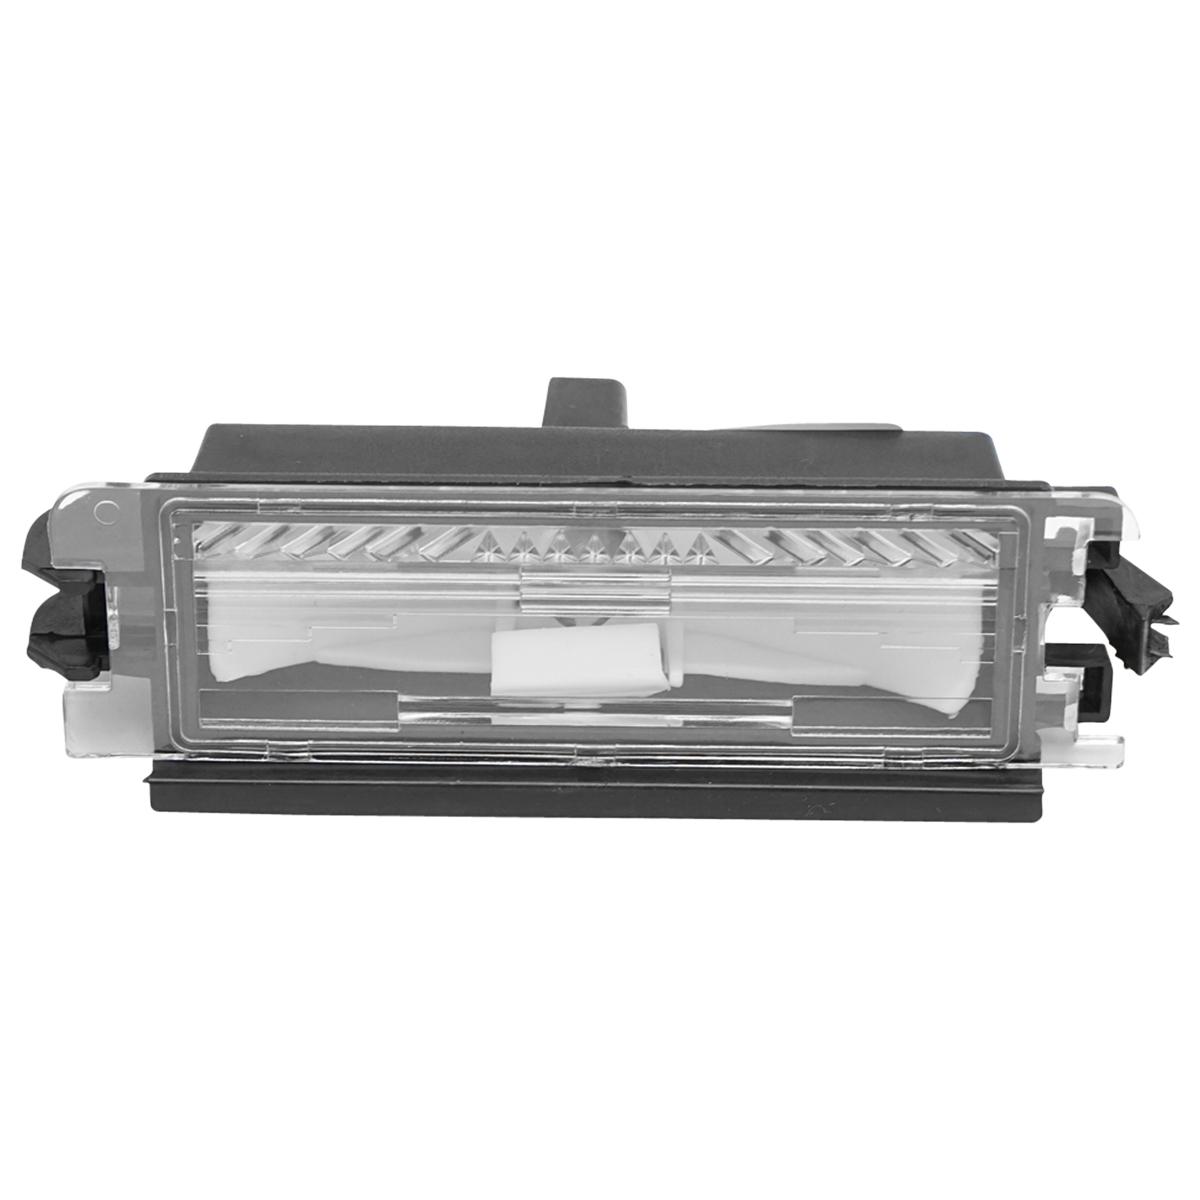 Lampa numar Dacia Logan m.v. 7700433414